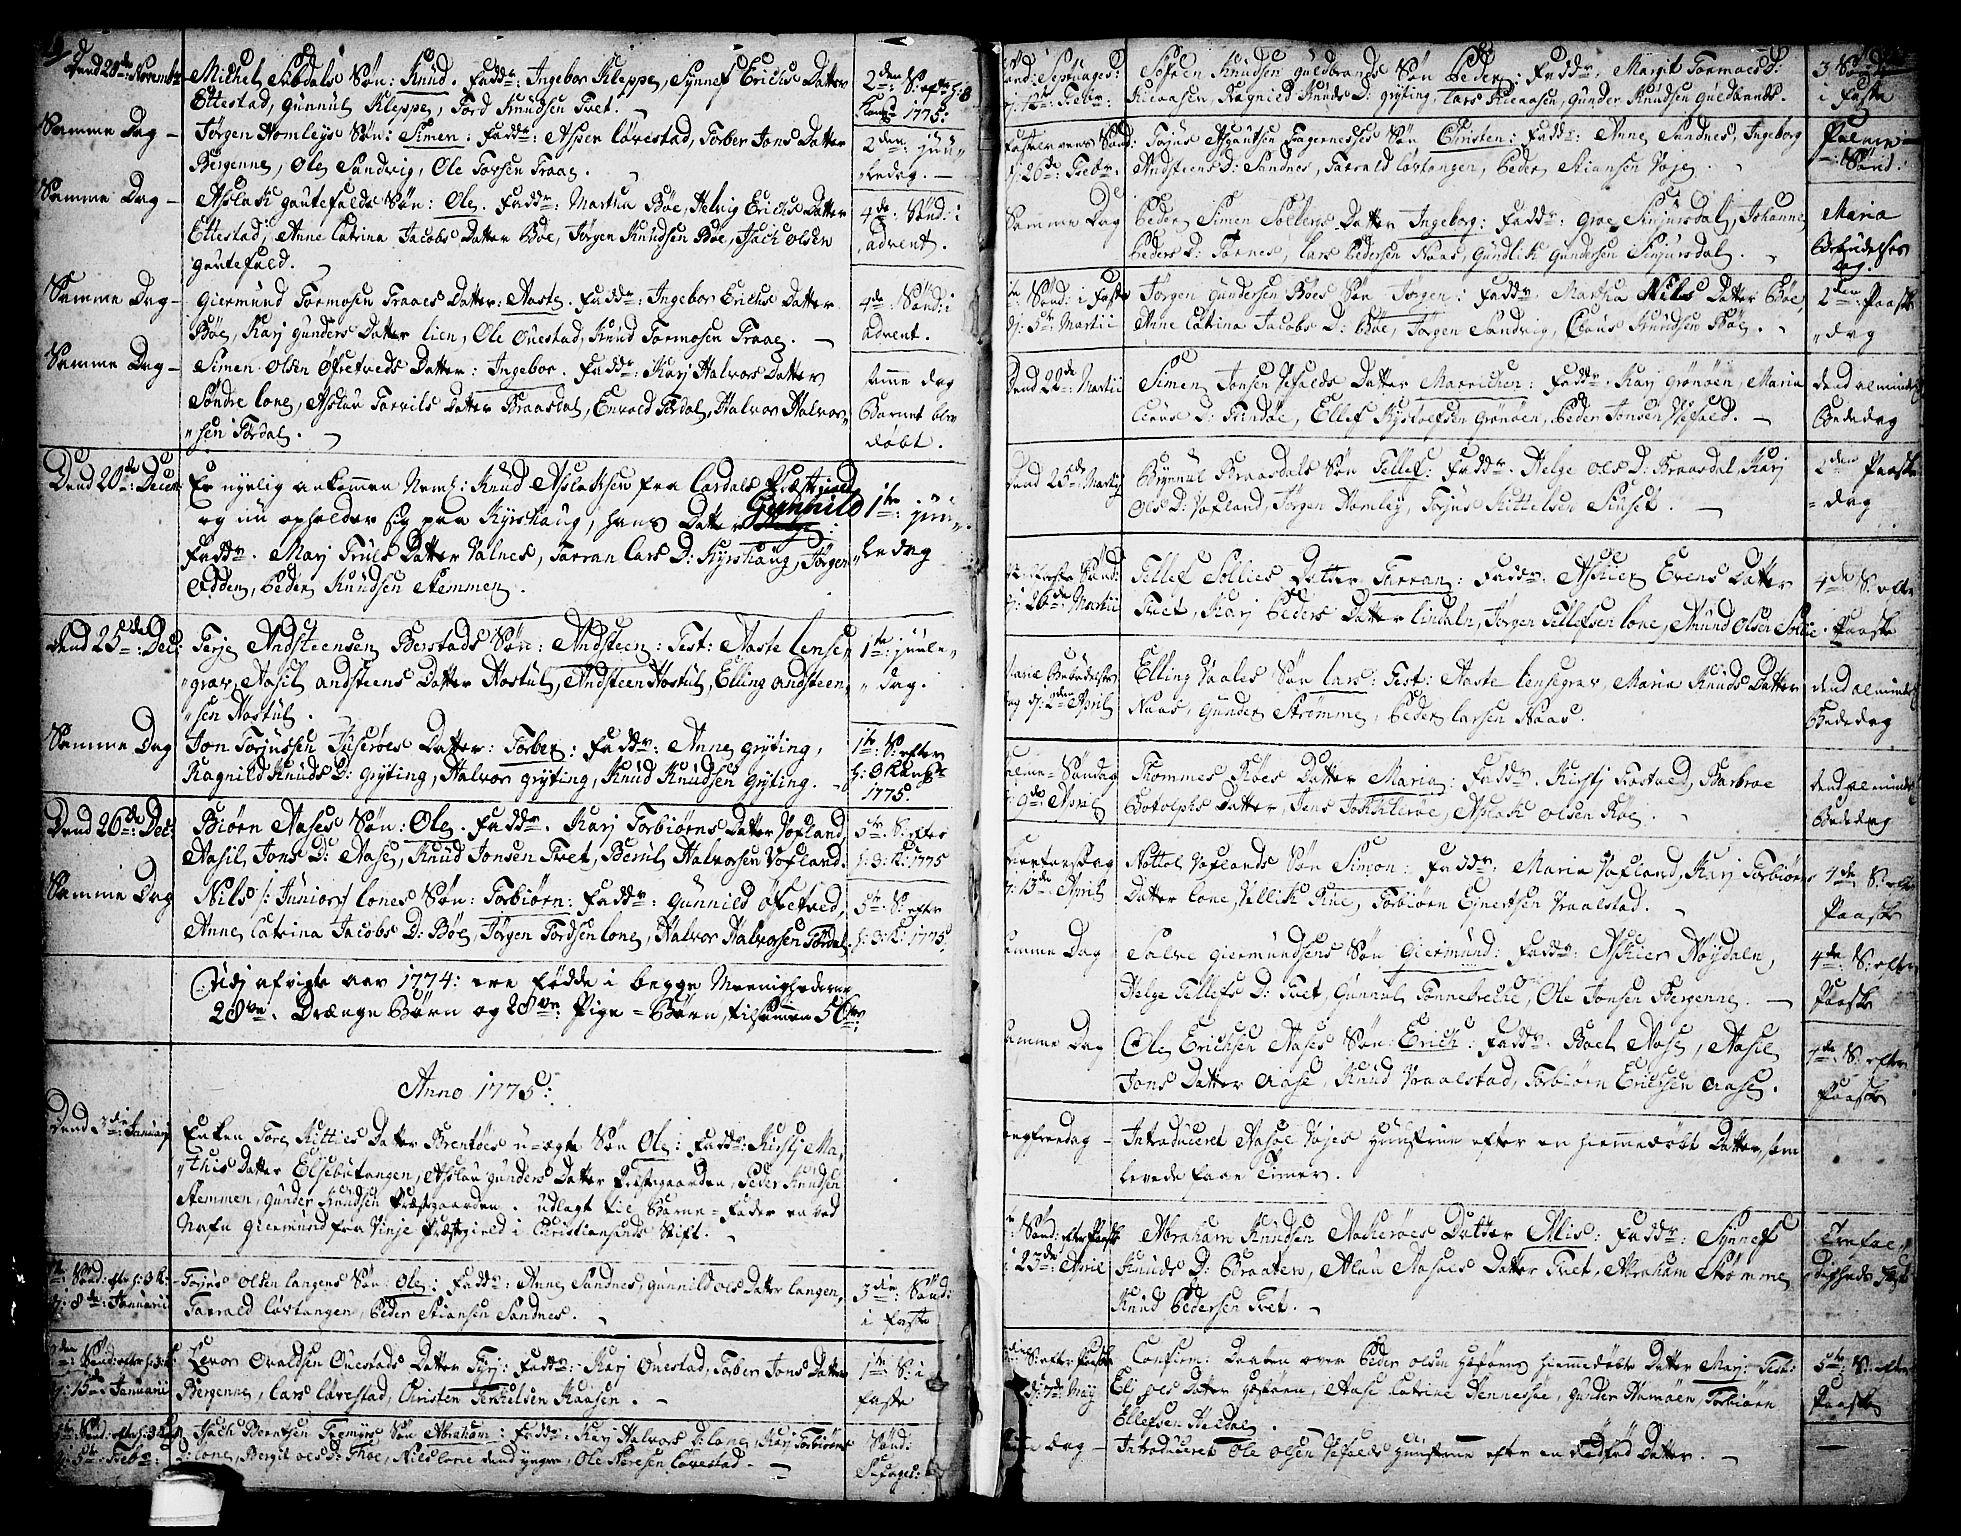 SAKO, Drangedal kirkebøker, F/Fa/L0003: Ministerialbok nr. 3, 1768-1814, s. 20-21